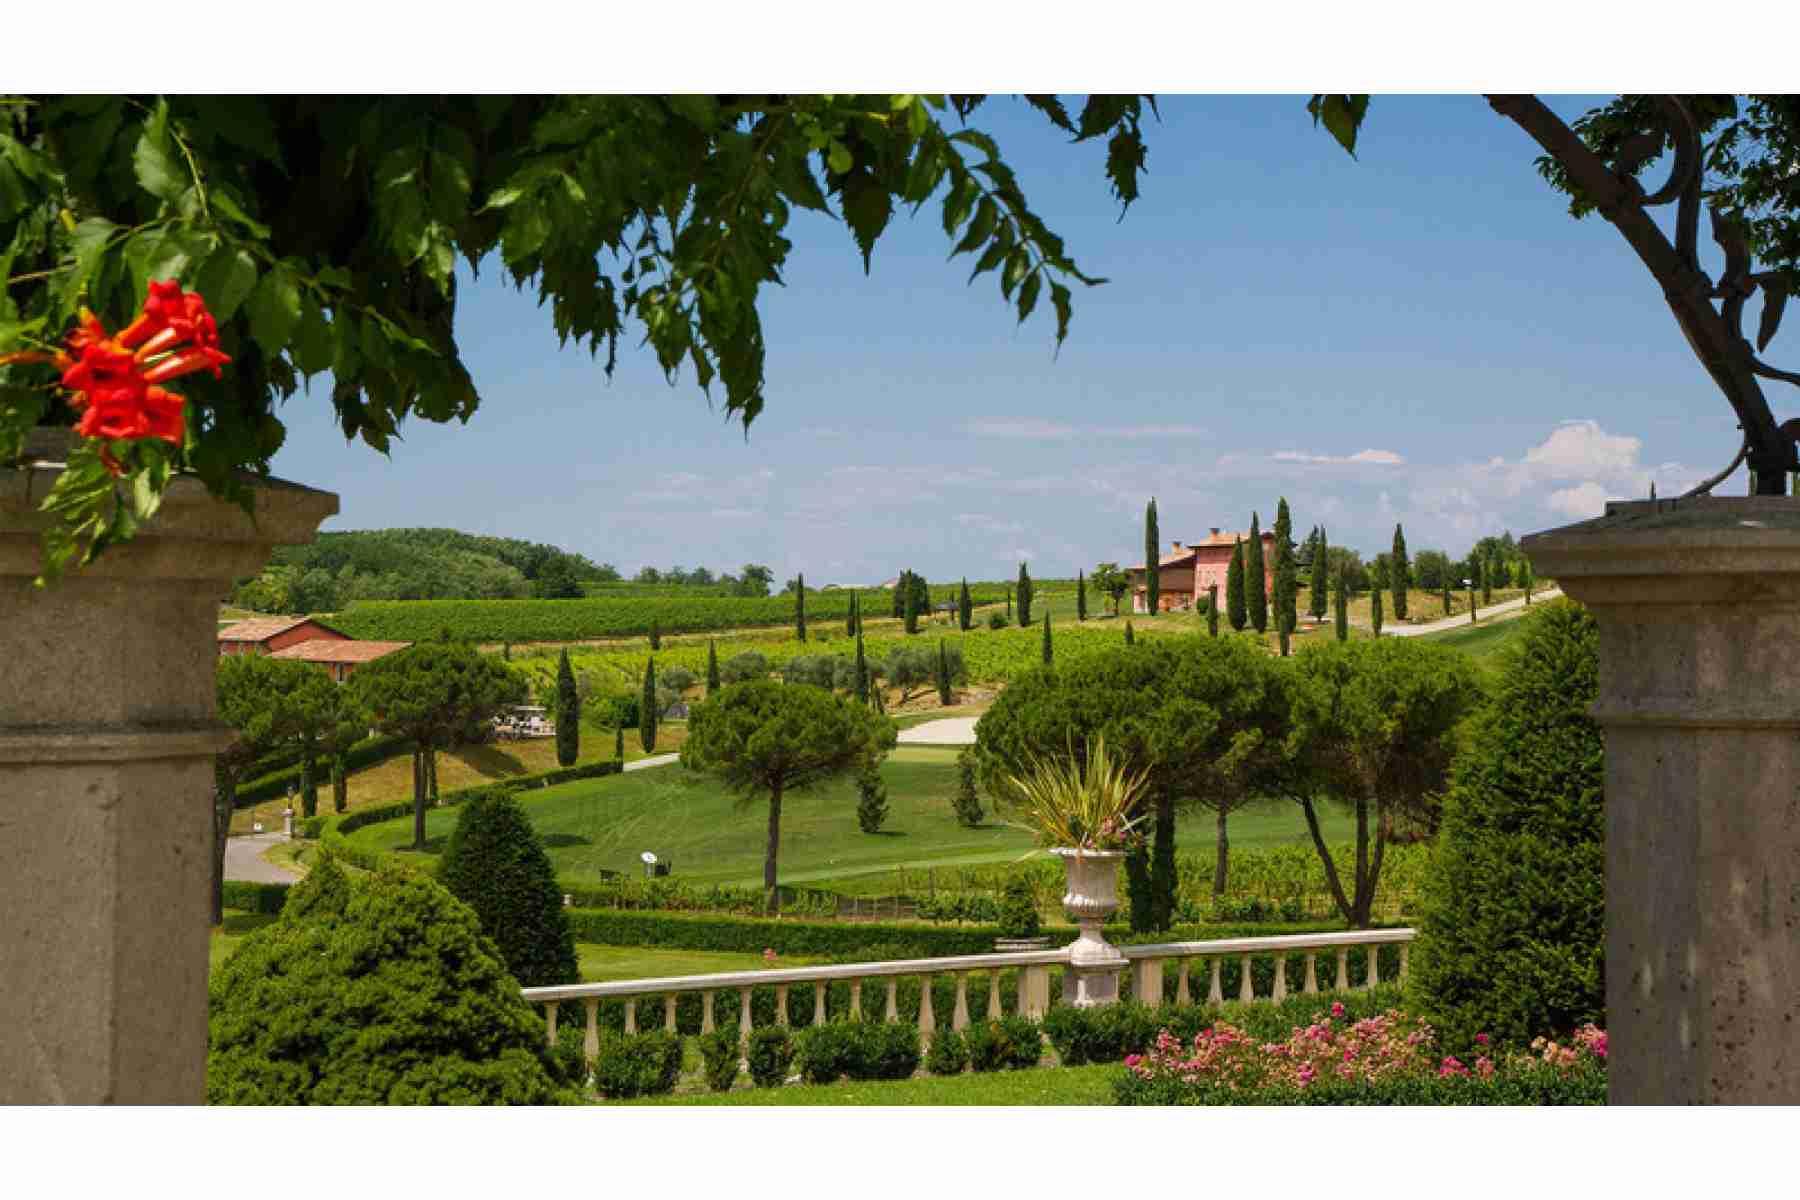 Golf Country Club & Taste: Collio - Wine Resort -Friuli Venezia Giulia - 3 days/ 2 nights 1 Round in Golf Club Collio  Wedding Package